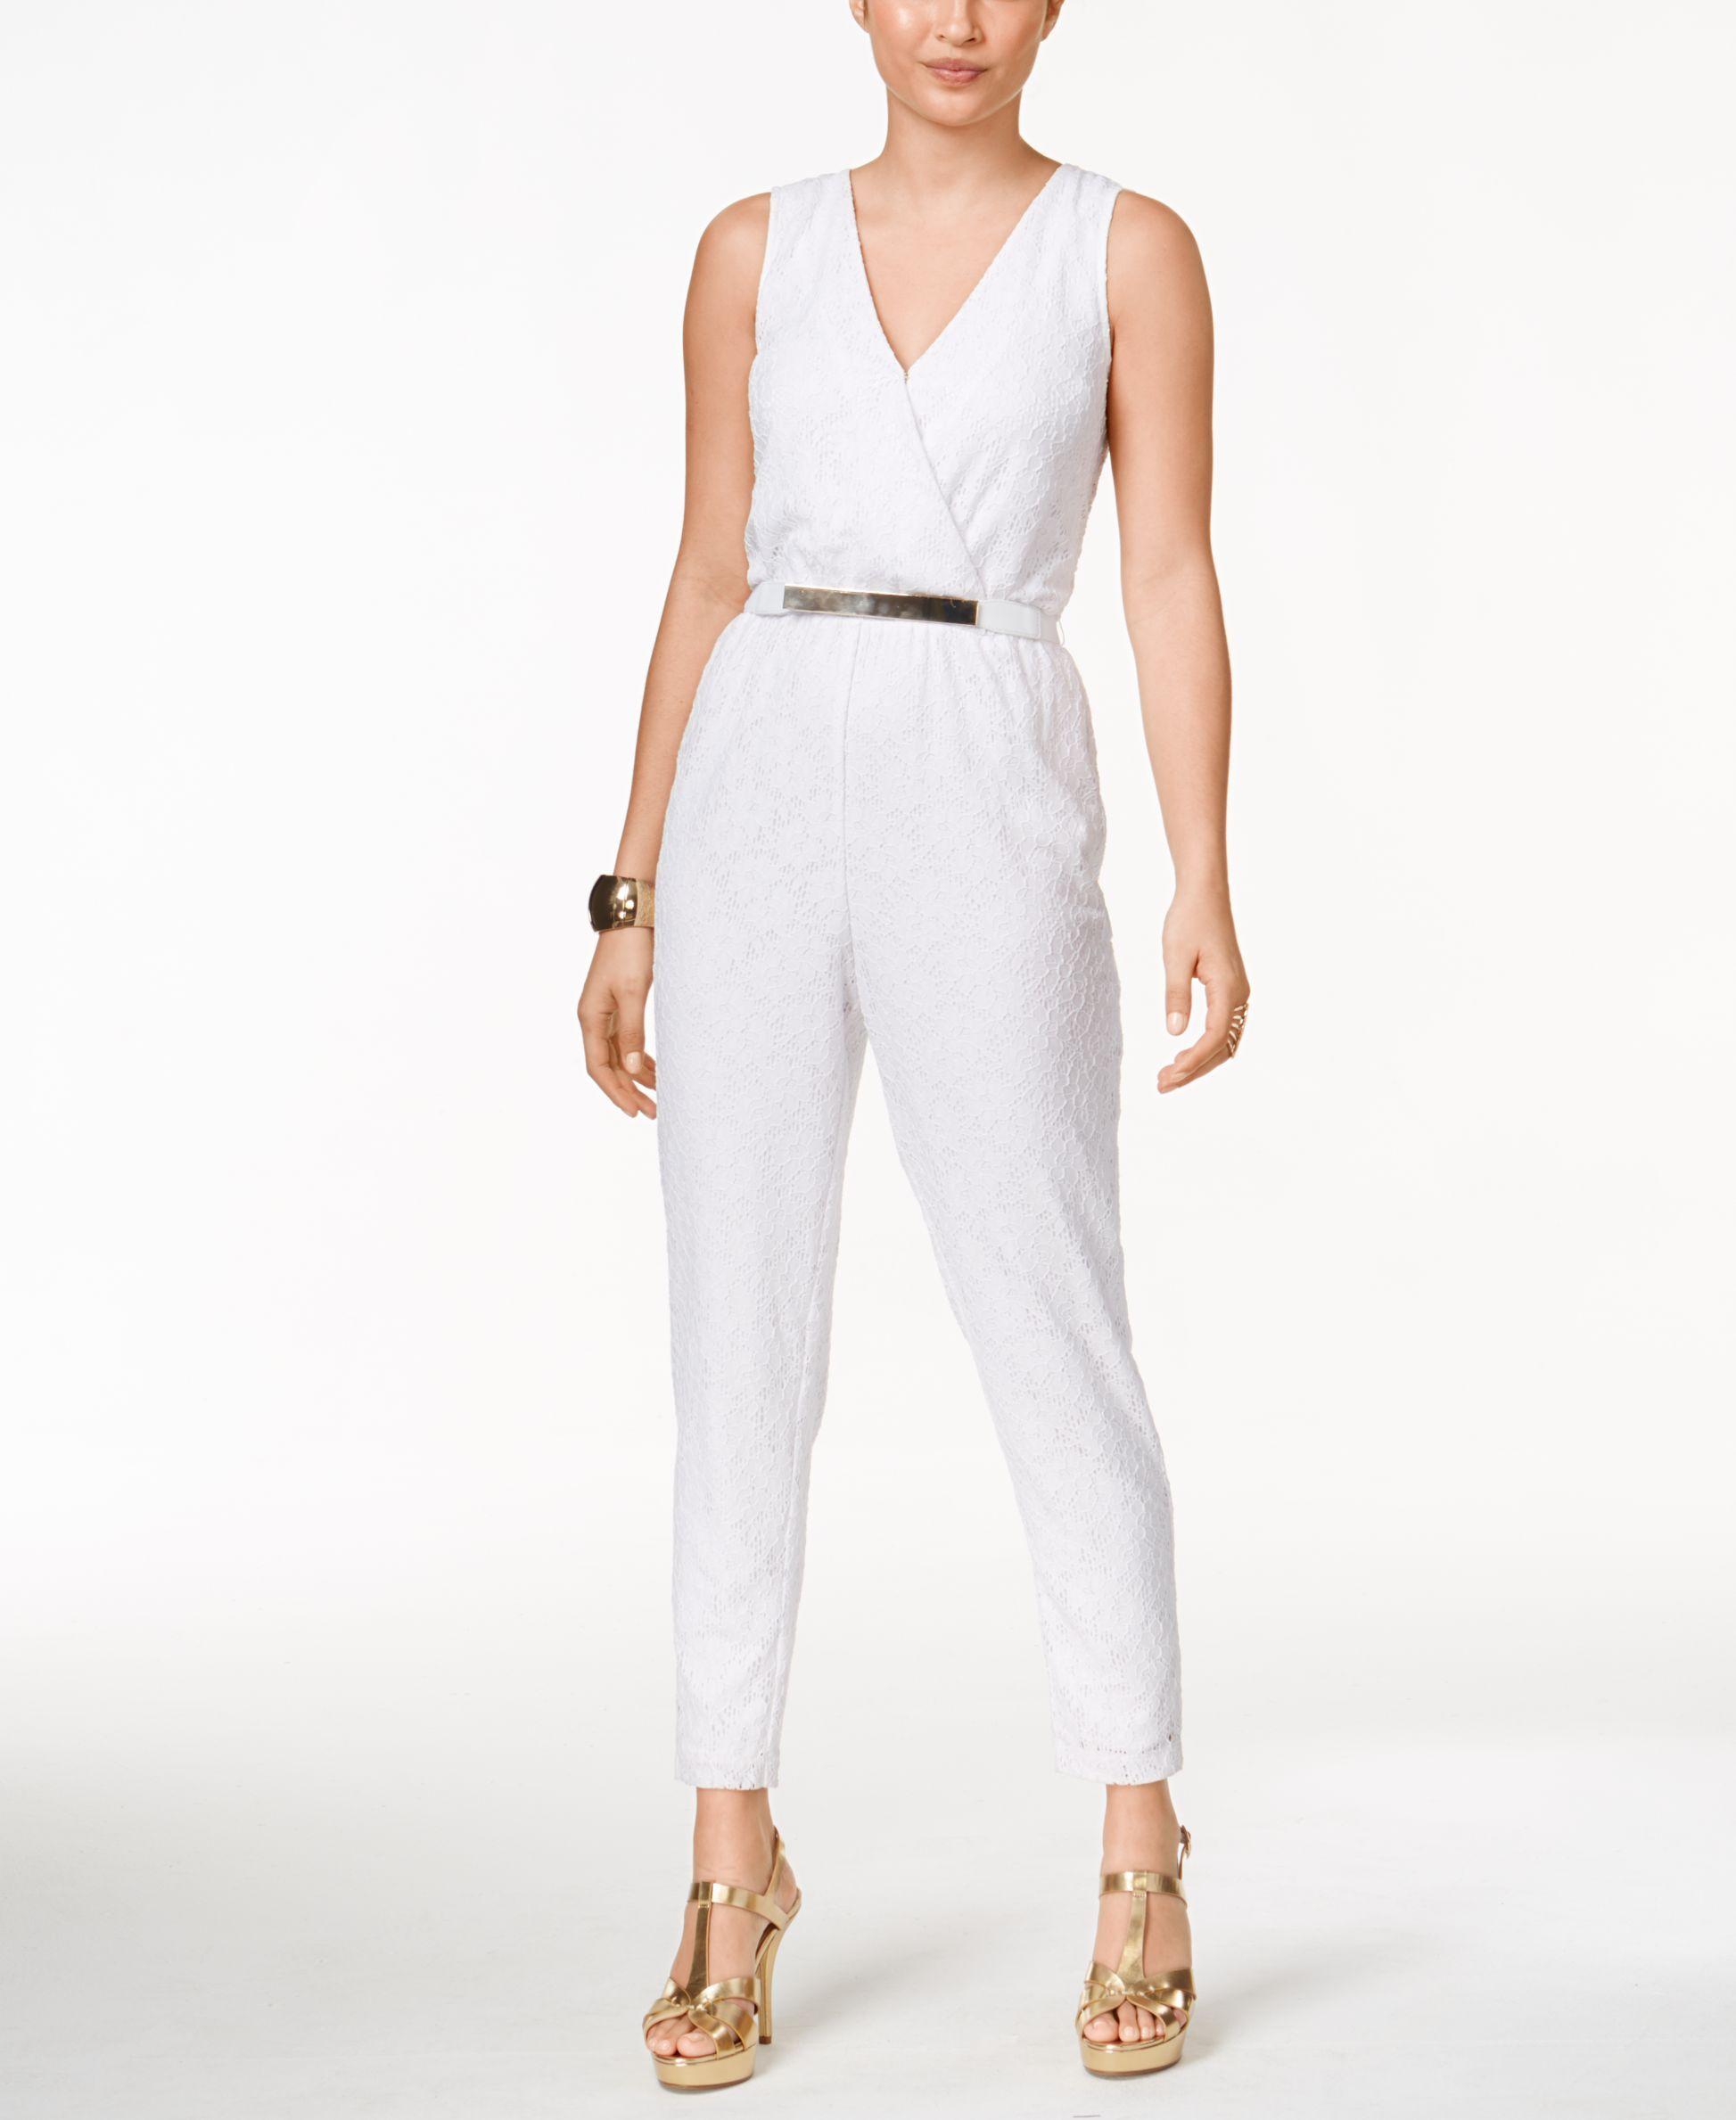 7b510f2660b Thalia Sodi Lace Belted Jumpsuit